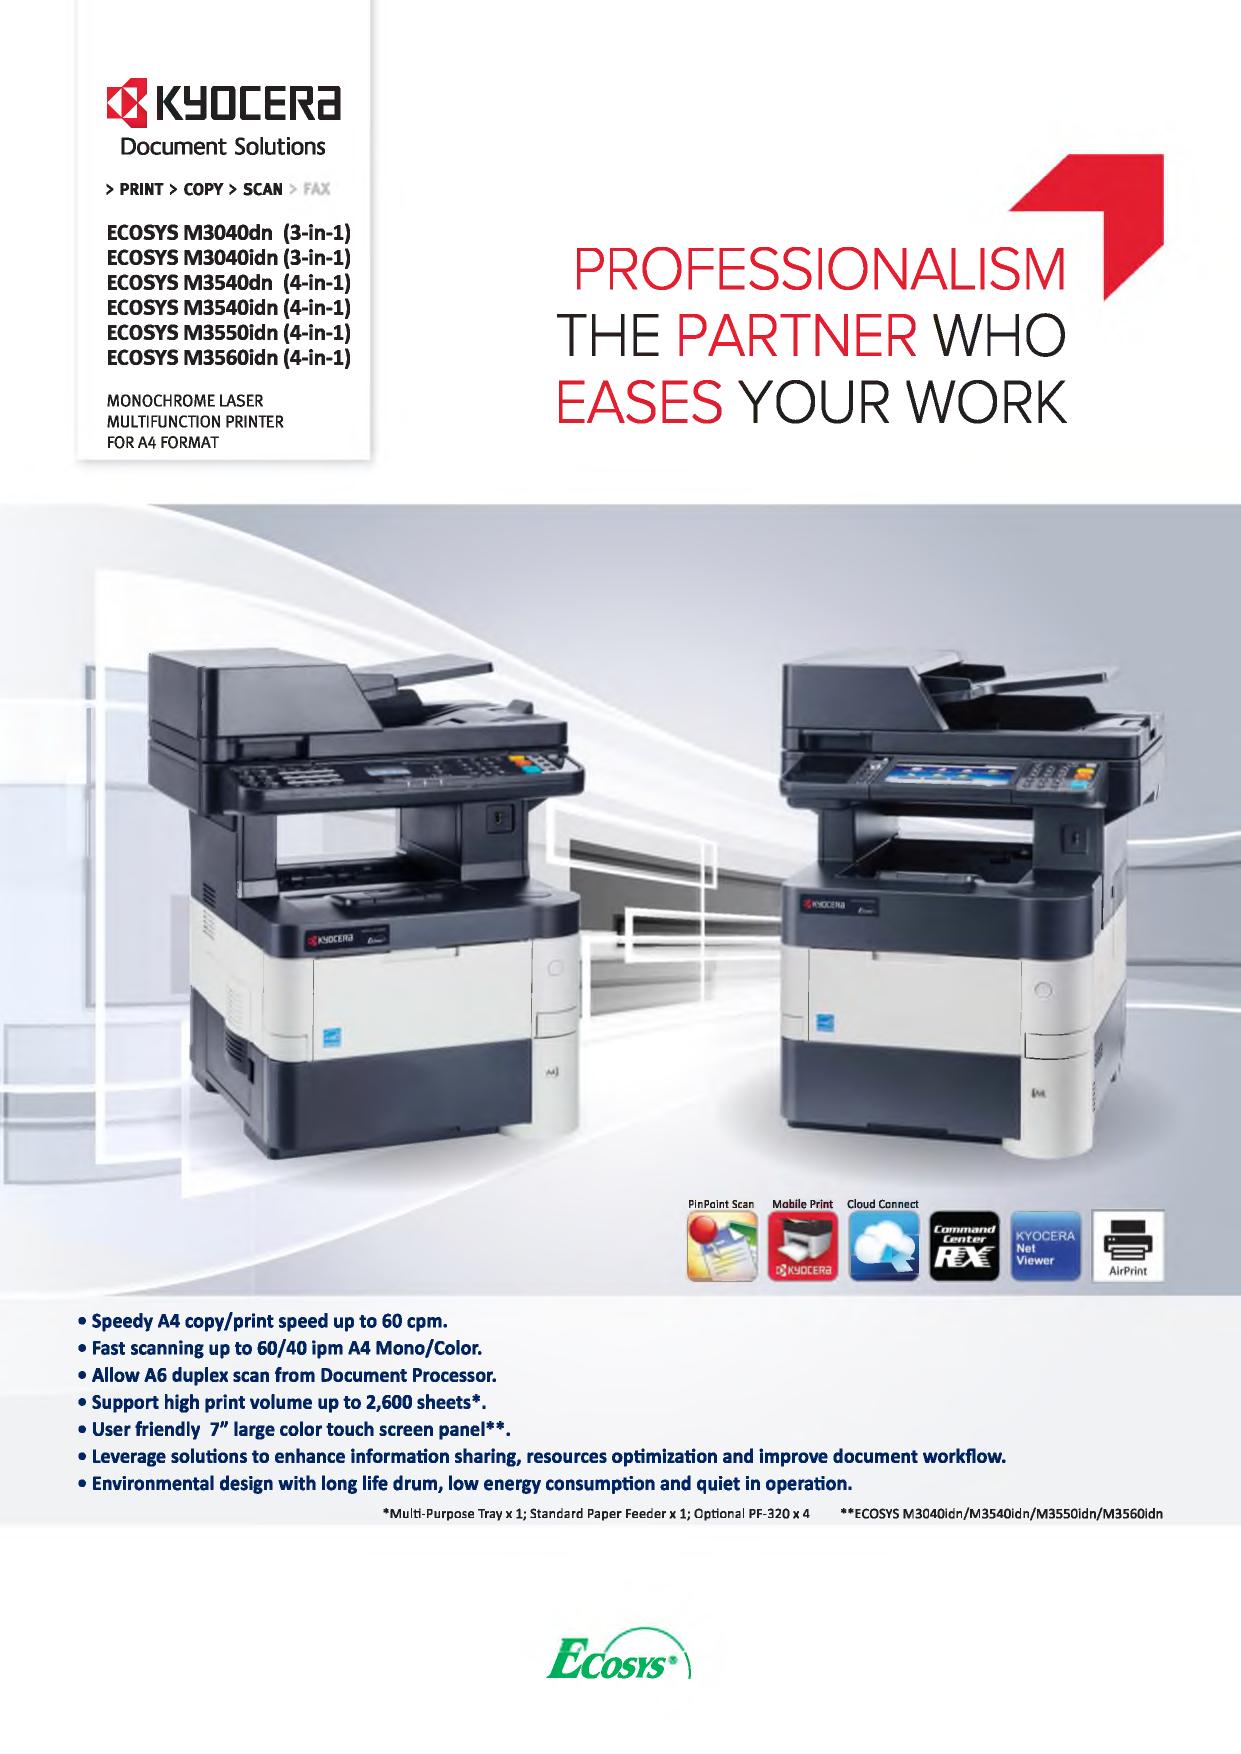 35 KyocERa - KYOCERA Document Solutions Hong Kong Limited   manualzz com